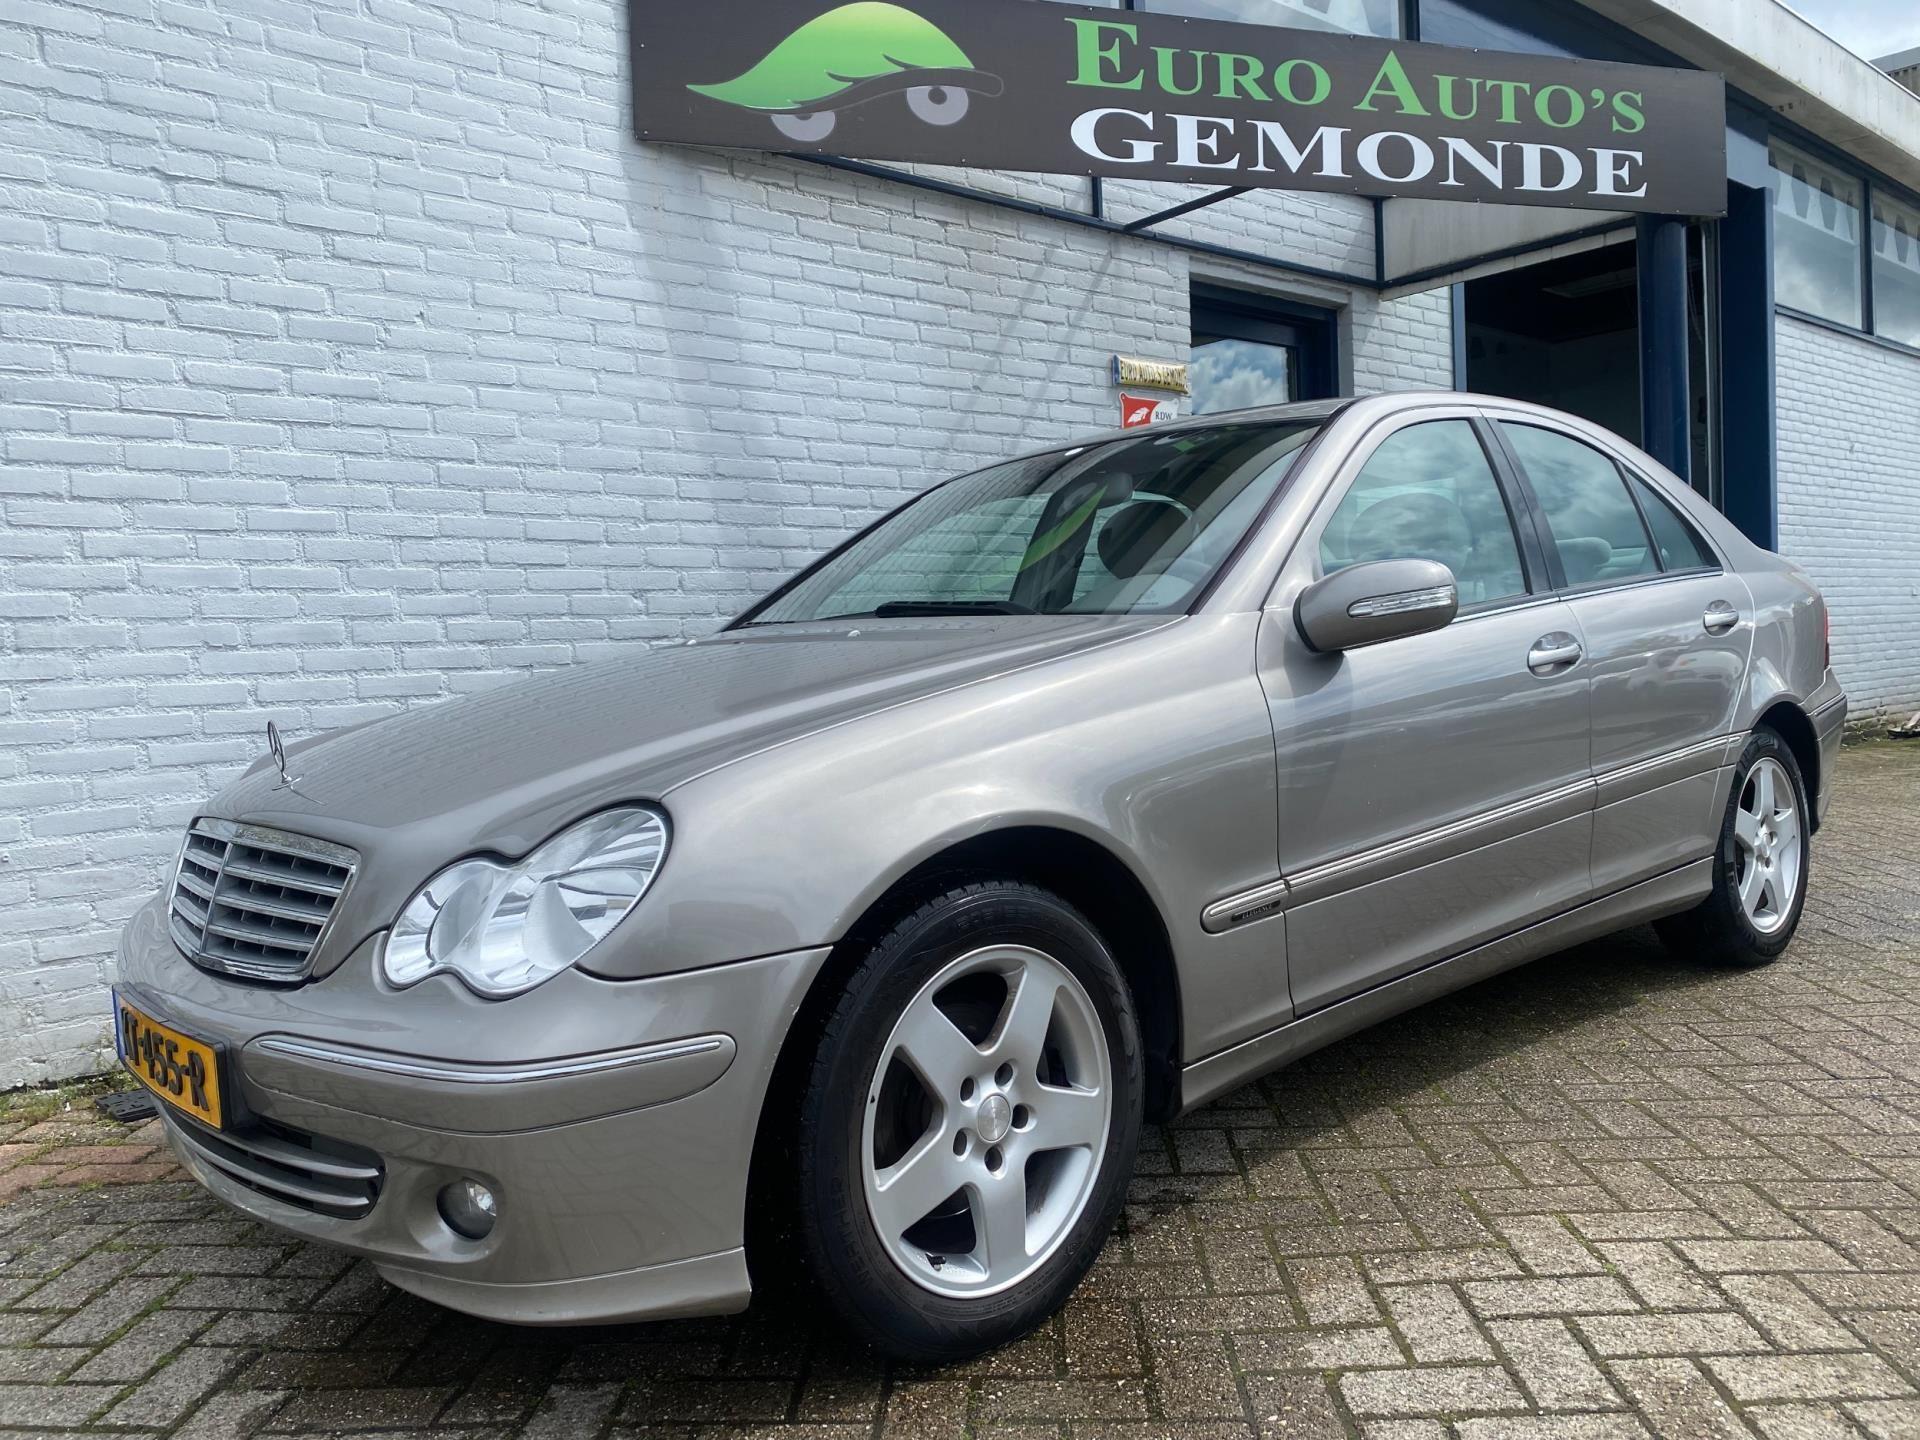 Mercedes-Benz C-klasse occasion - Euro Auto's Gemonde